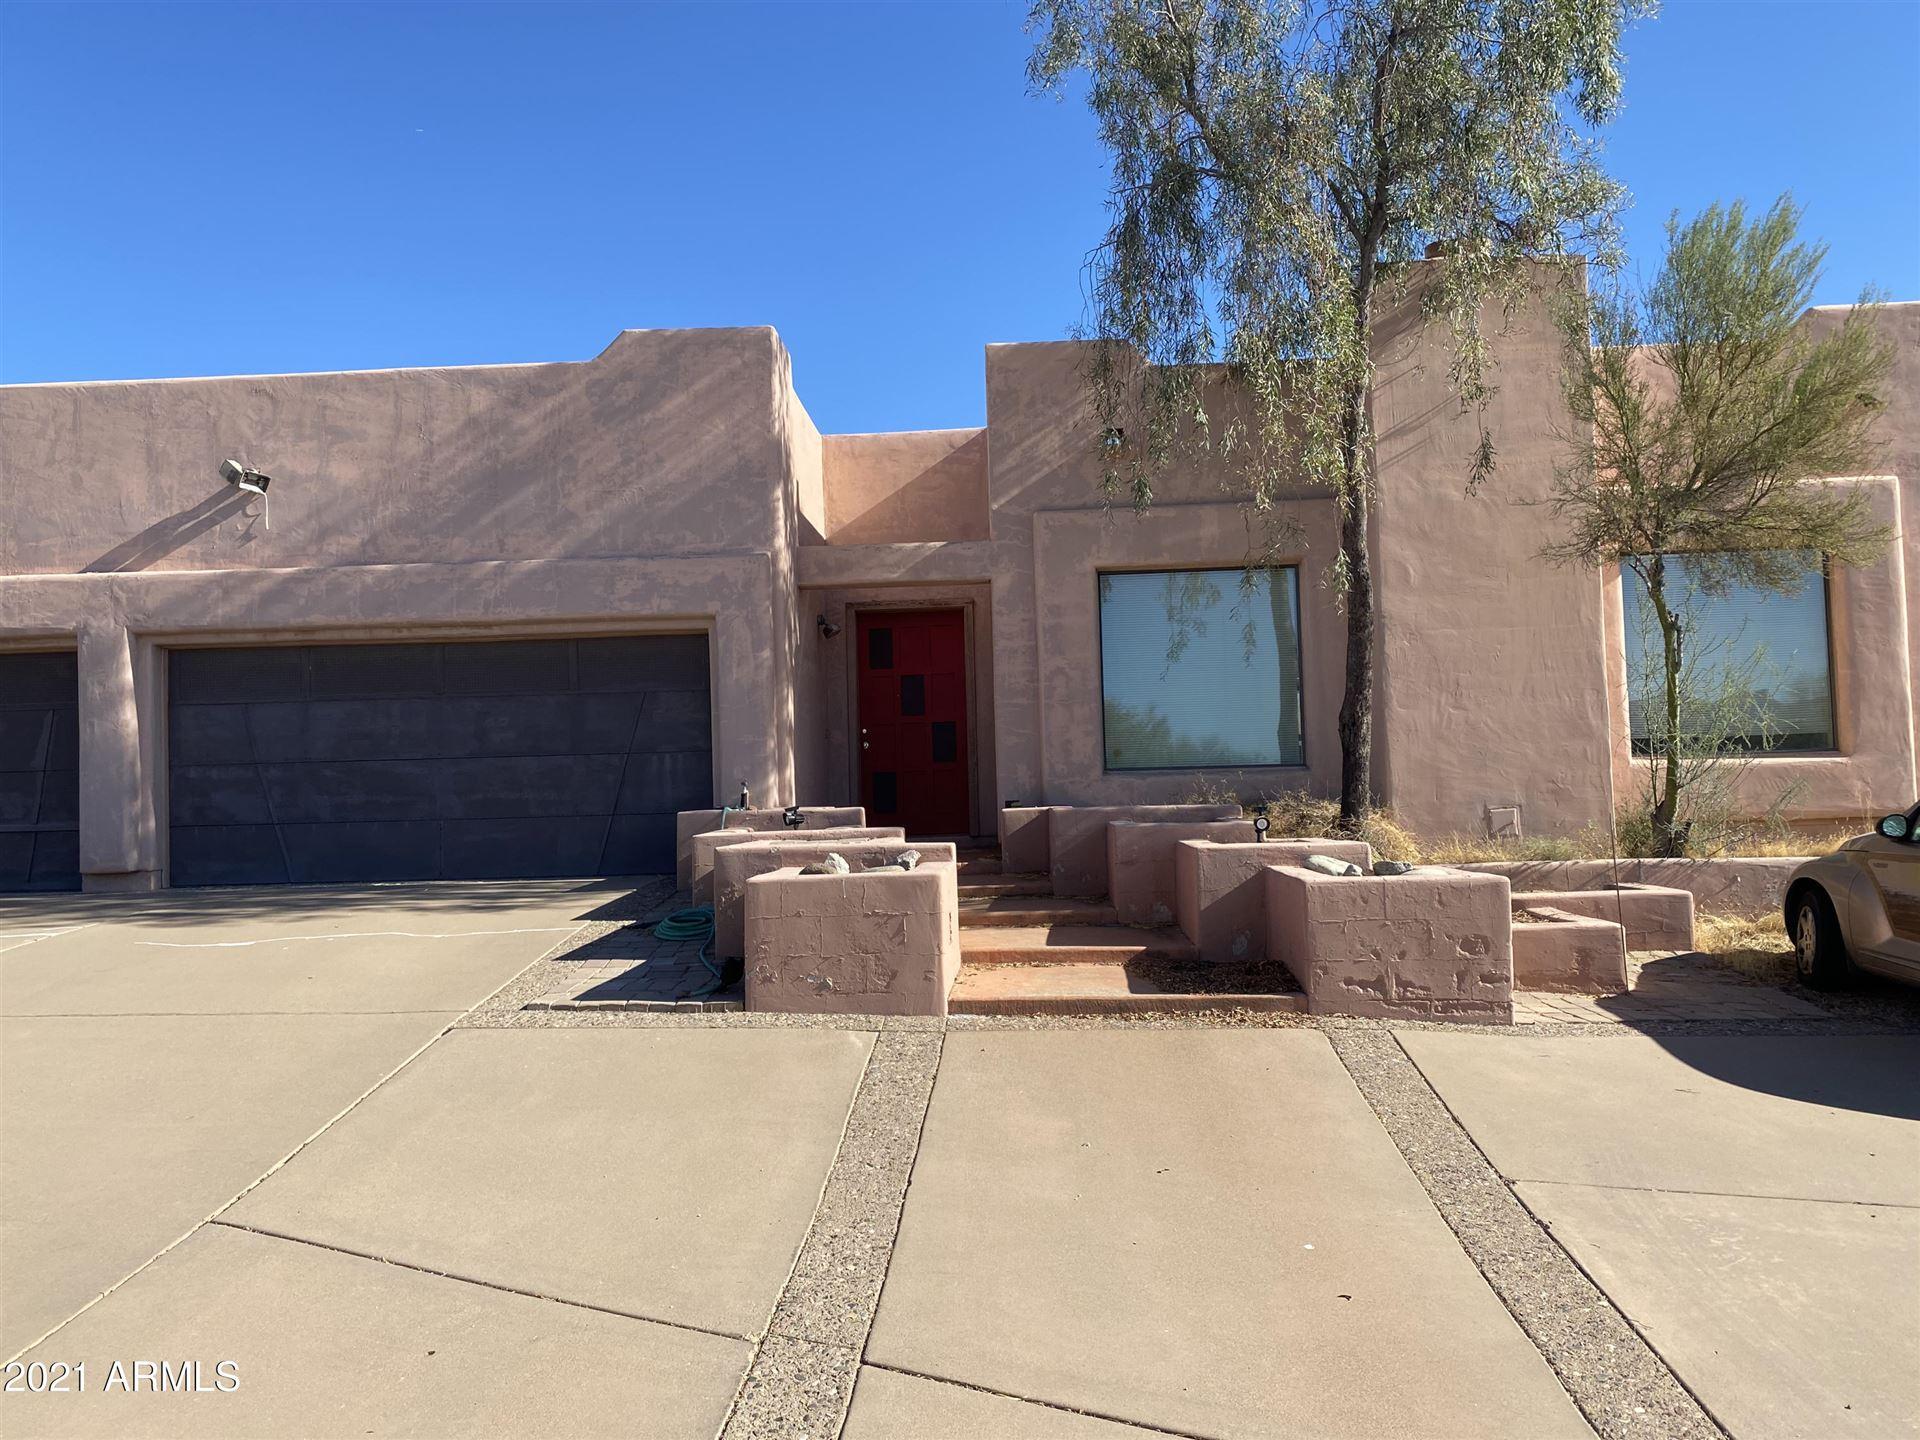 Photo of 8650 E SHORT PUTT Place, Carefree, AZ 85377 (MLS # 6267380)